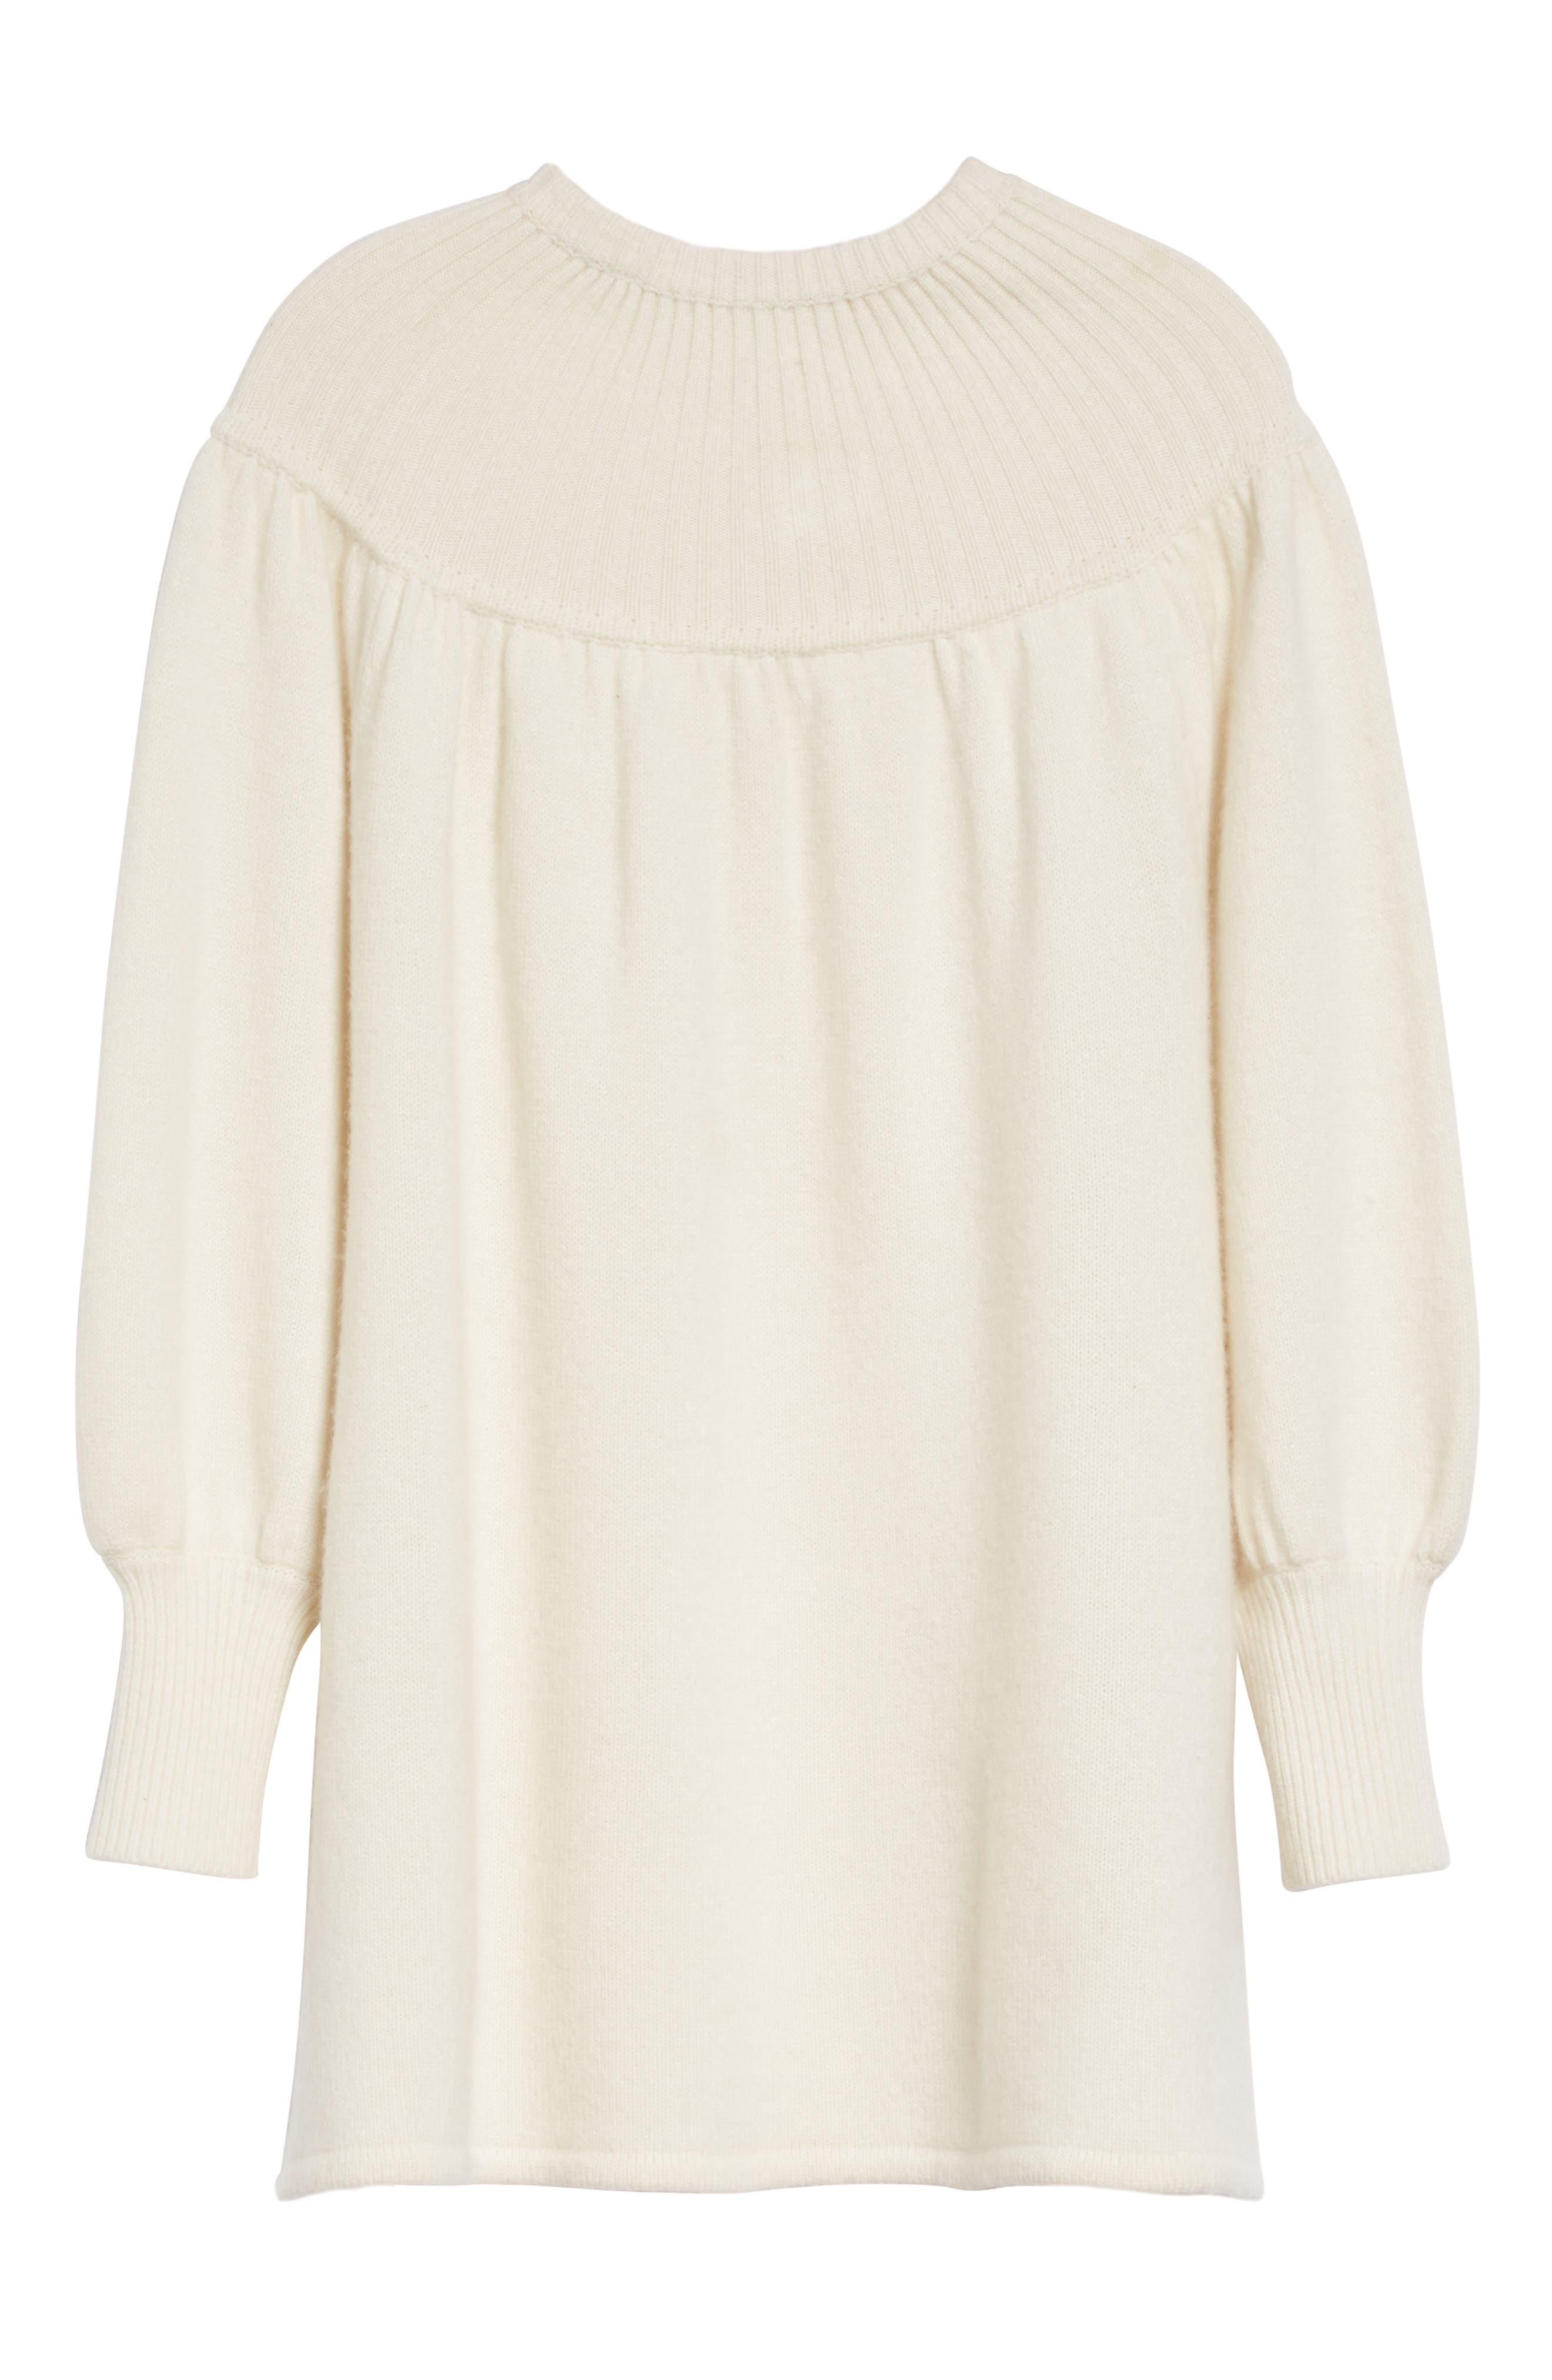 Rib Knit Cashmere Tunic Sweater,                             Alternate thumbnail 4, color,                             Ivory